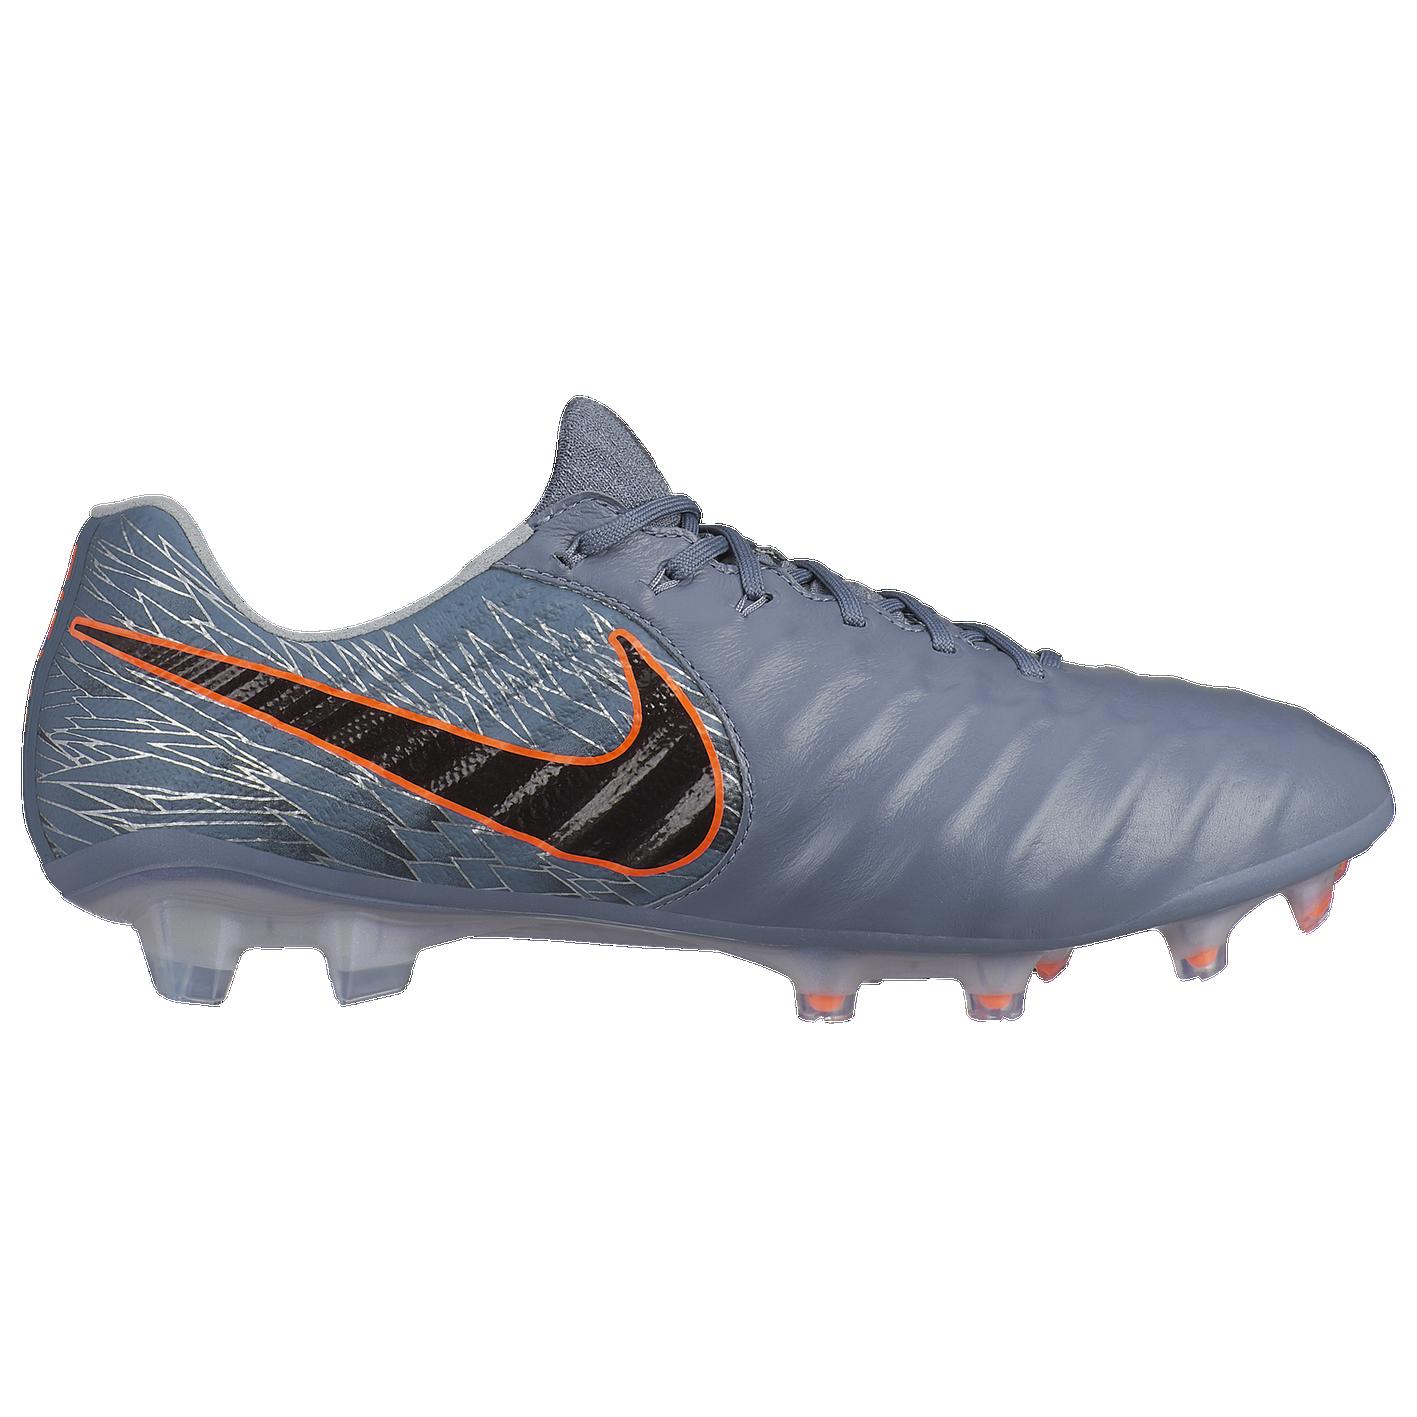 36a475abf14 Nike Tiempo Legend 7 Elite FG - Men s - Soccer - Shoes - Grey